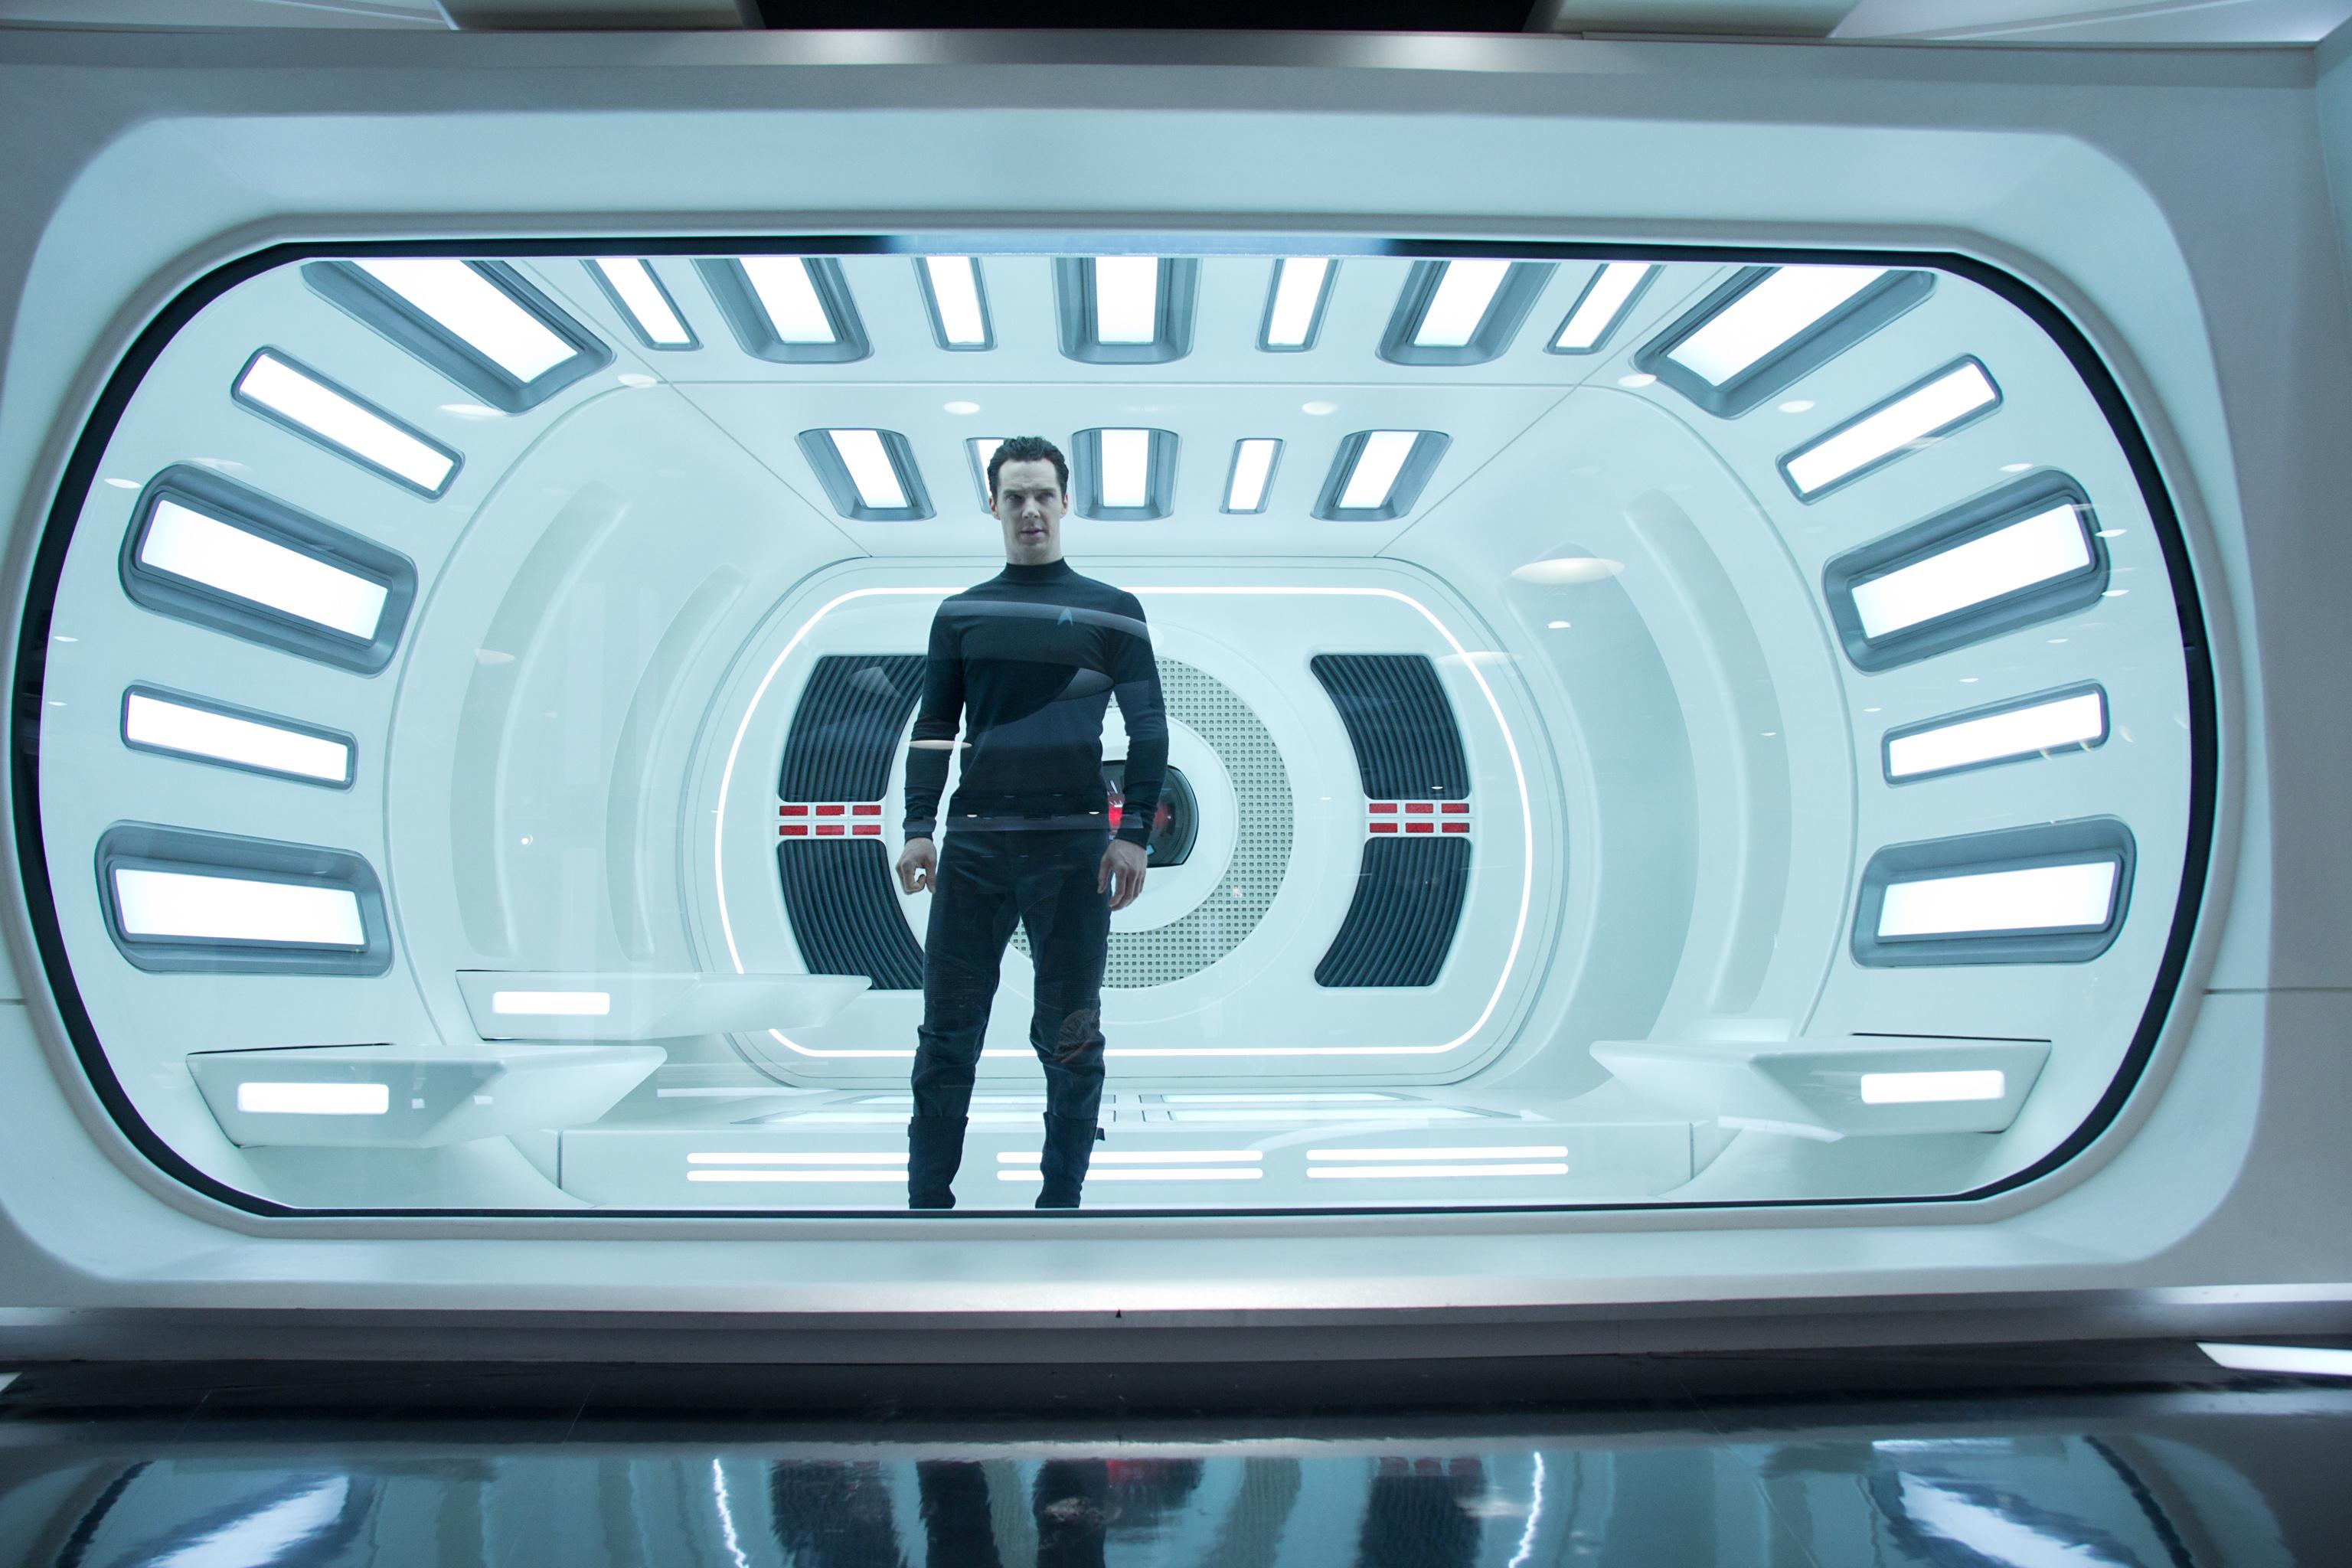 Star Trek Into Darkness Preview - Benedict Cumberbath (John Harrison)